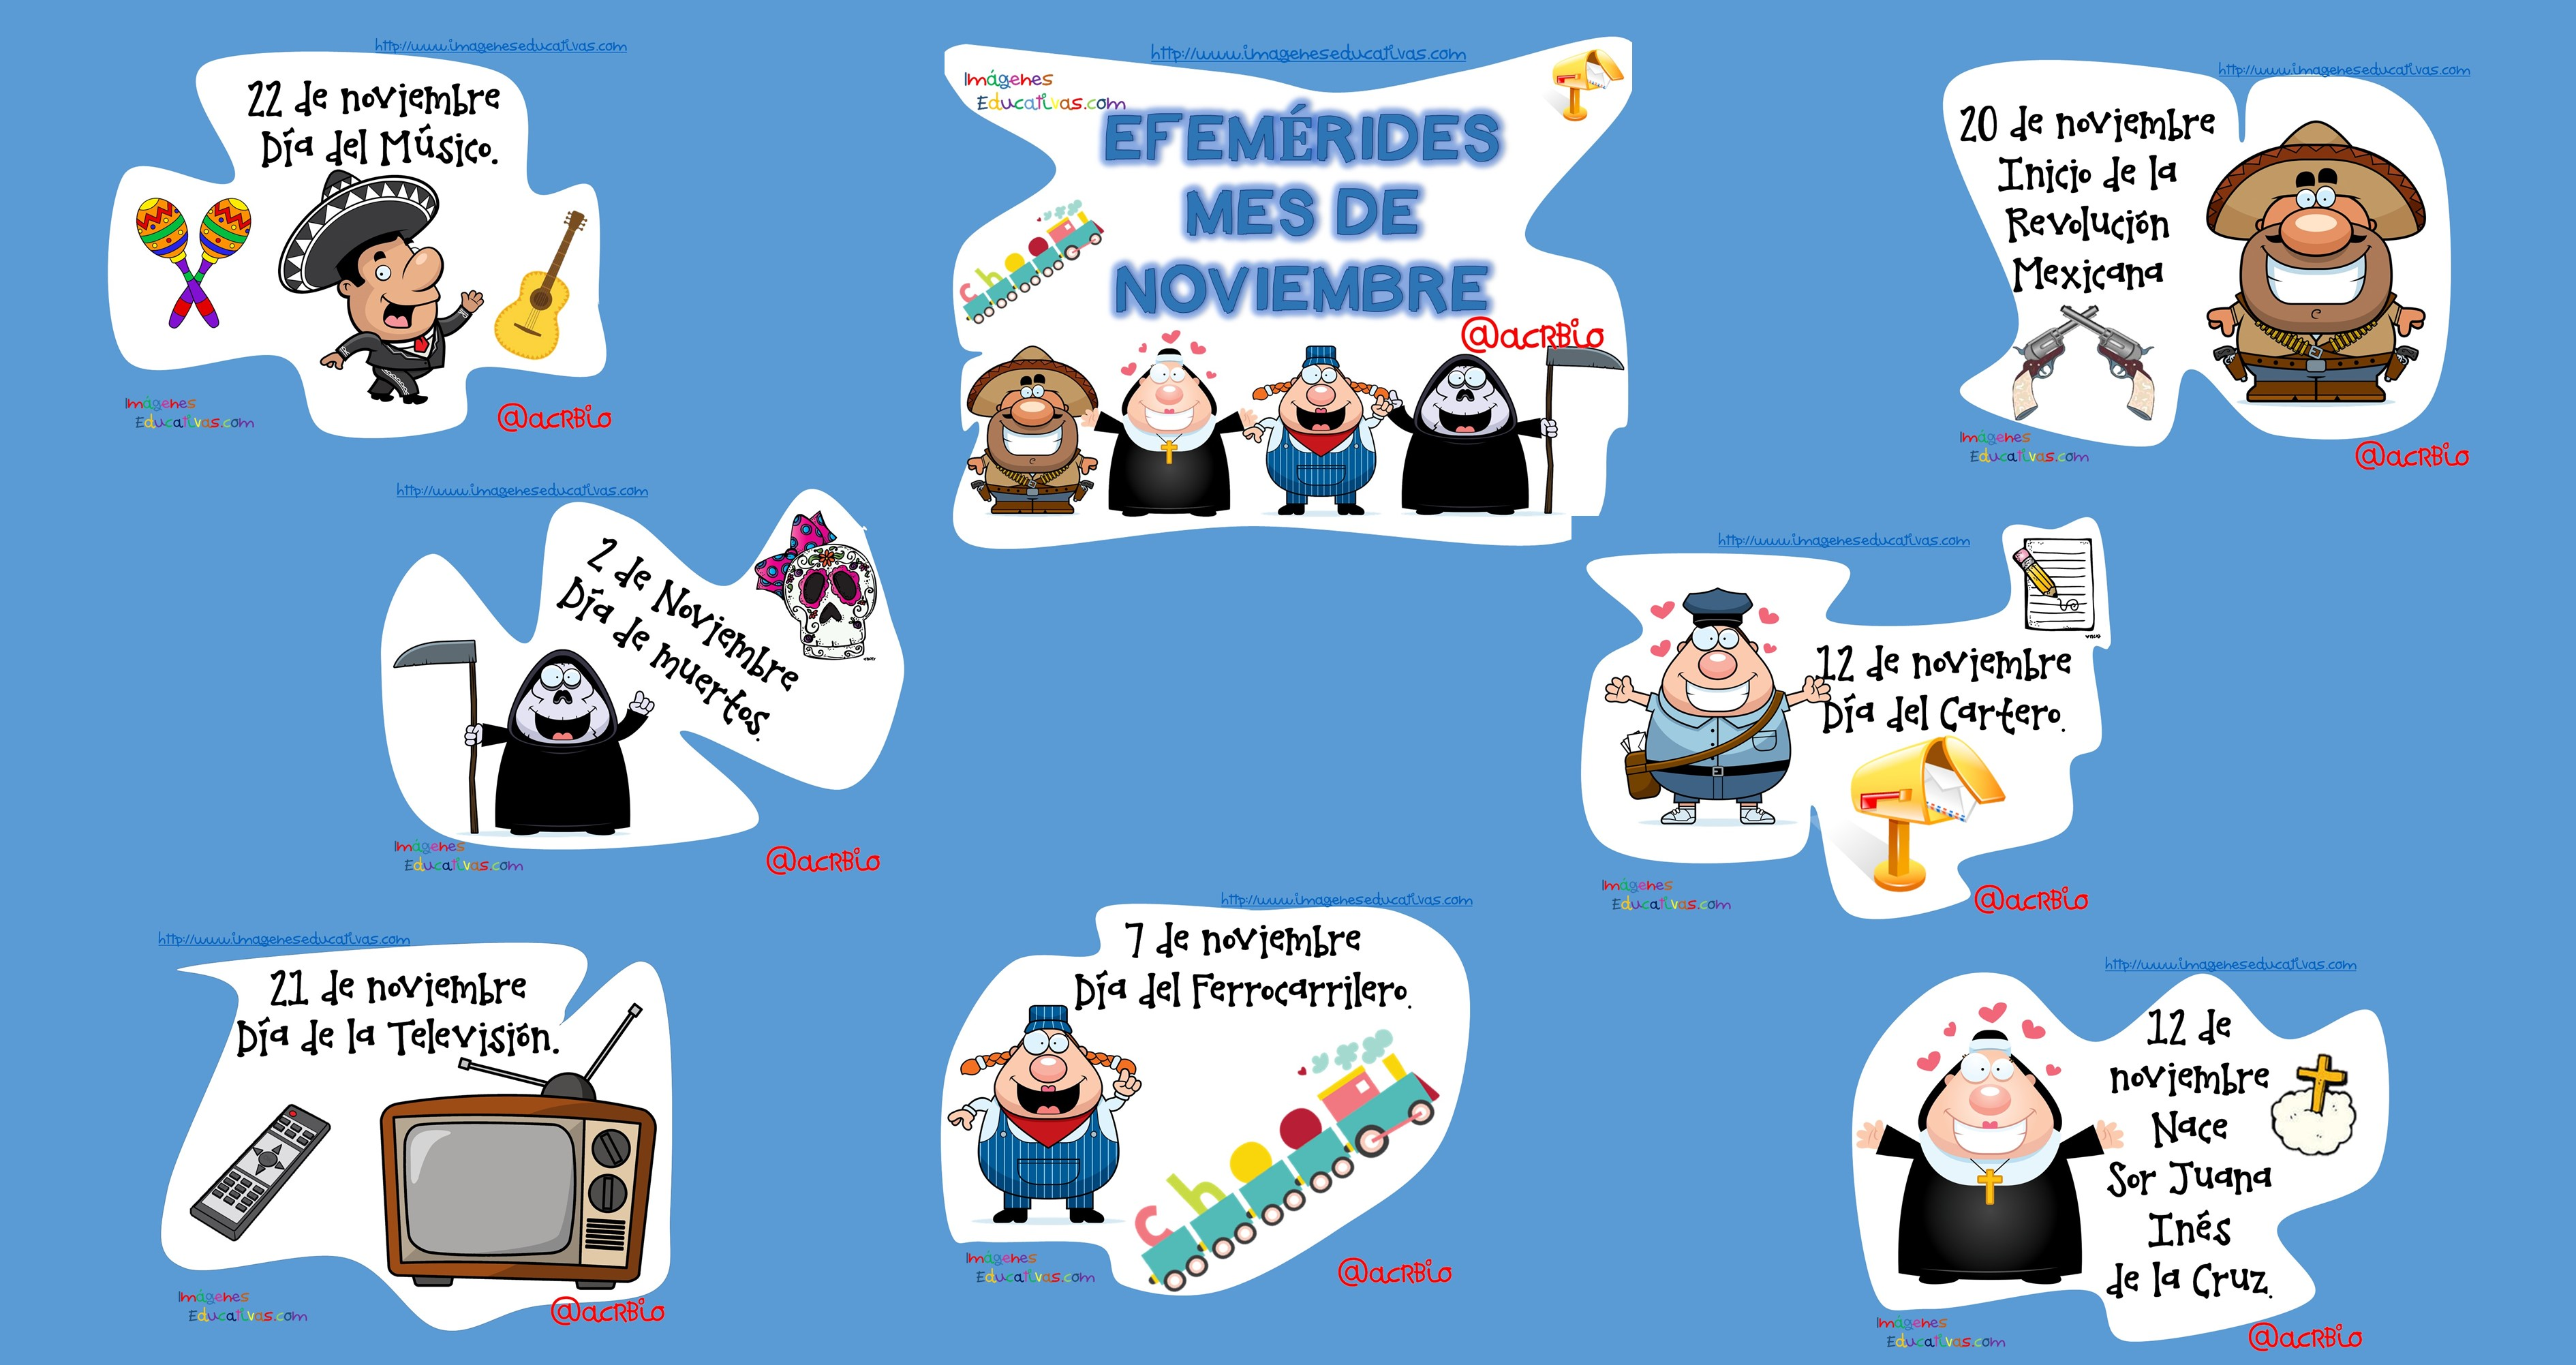 Periodico mural noviembre - Imagenes Educativas